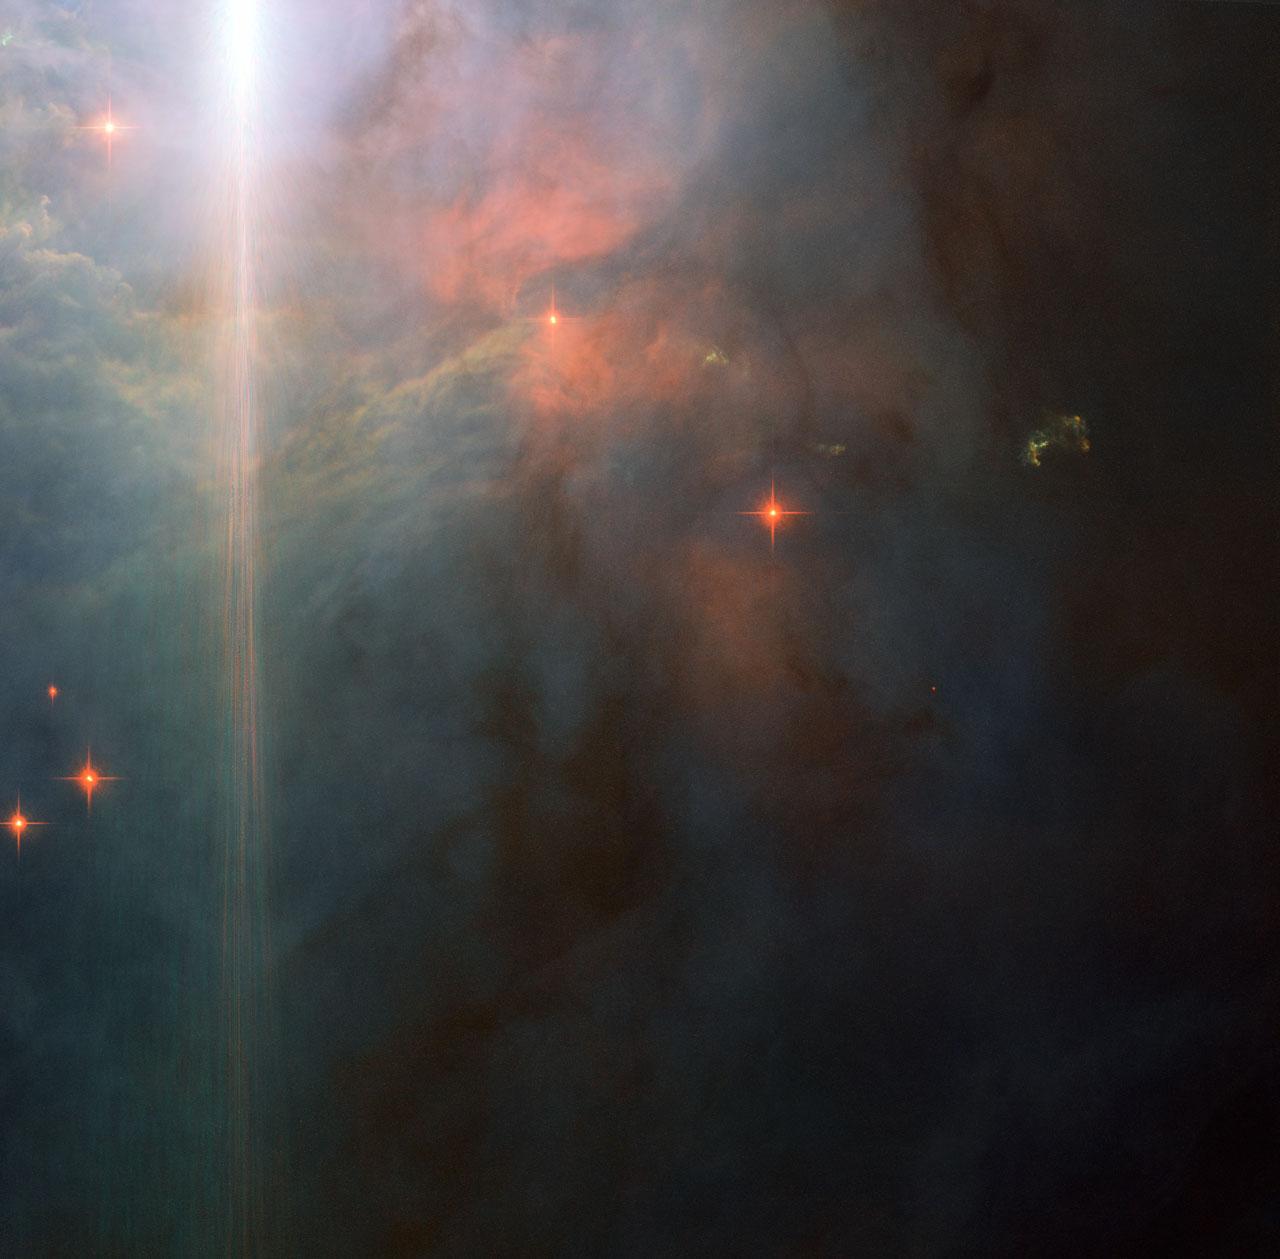 hubble telescope constellation - photo #38